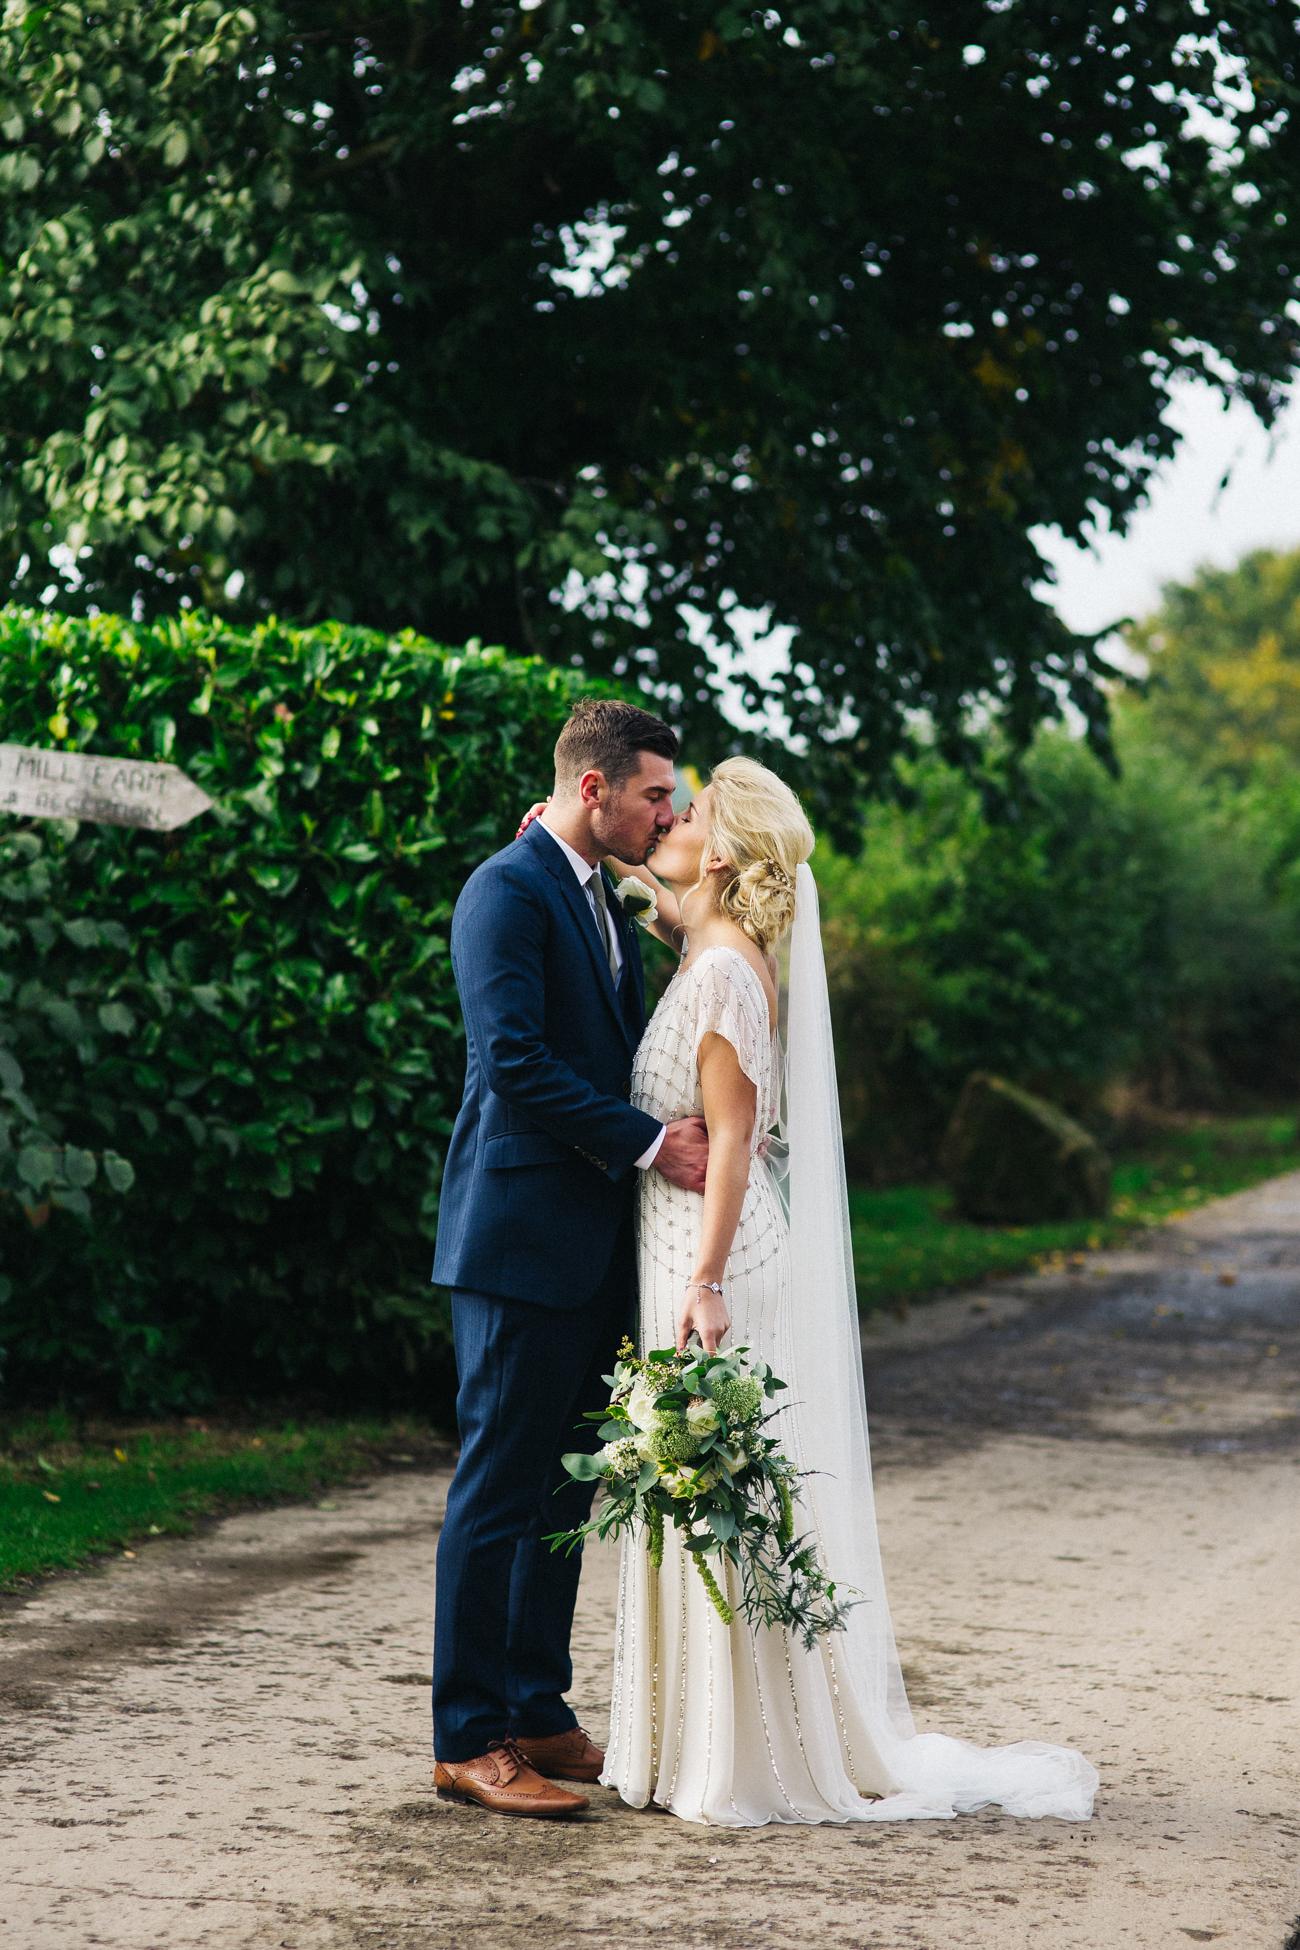 creative-wedding-photography-teesside-north-east-yorkshire-122.jpg